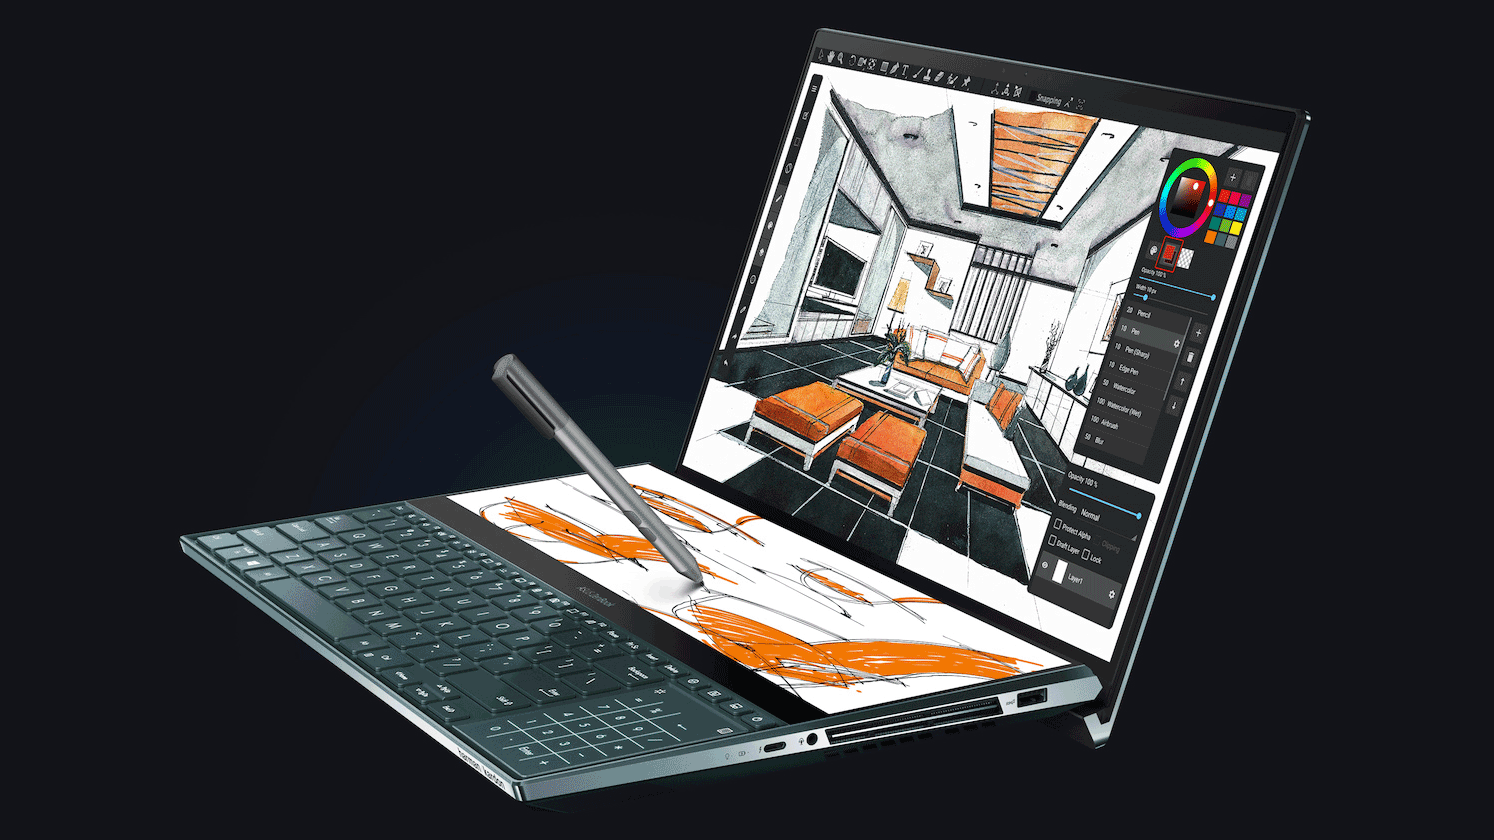 Asus ZenBook Pro Duo Laptop Builds on the MacBook Pro's